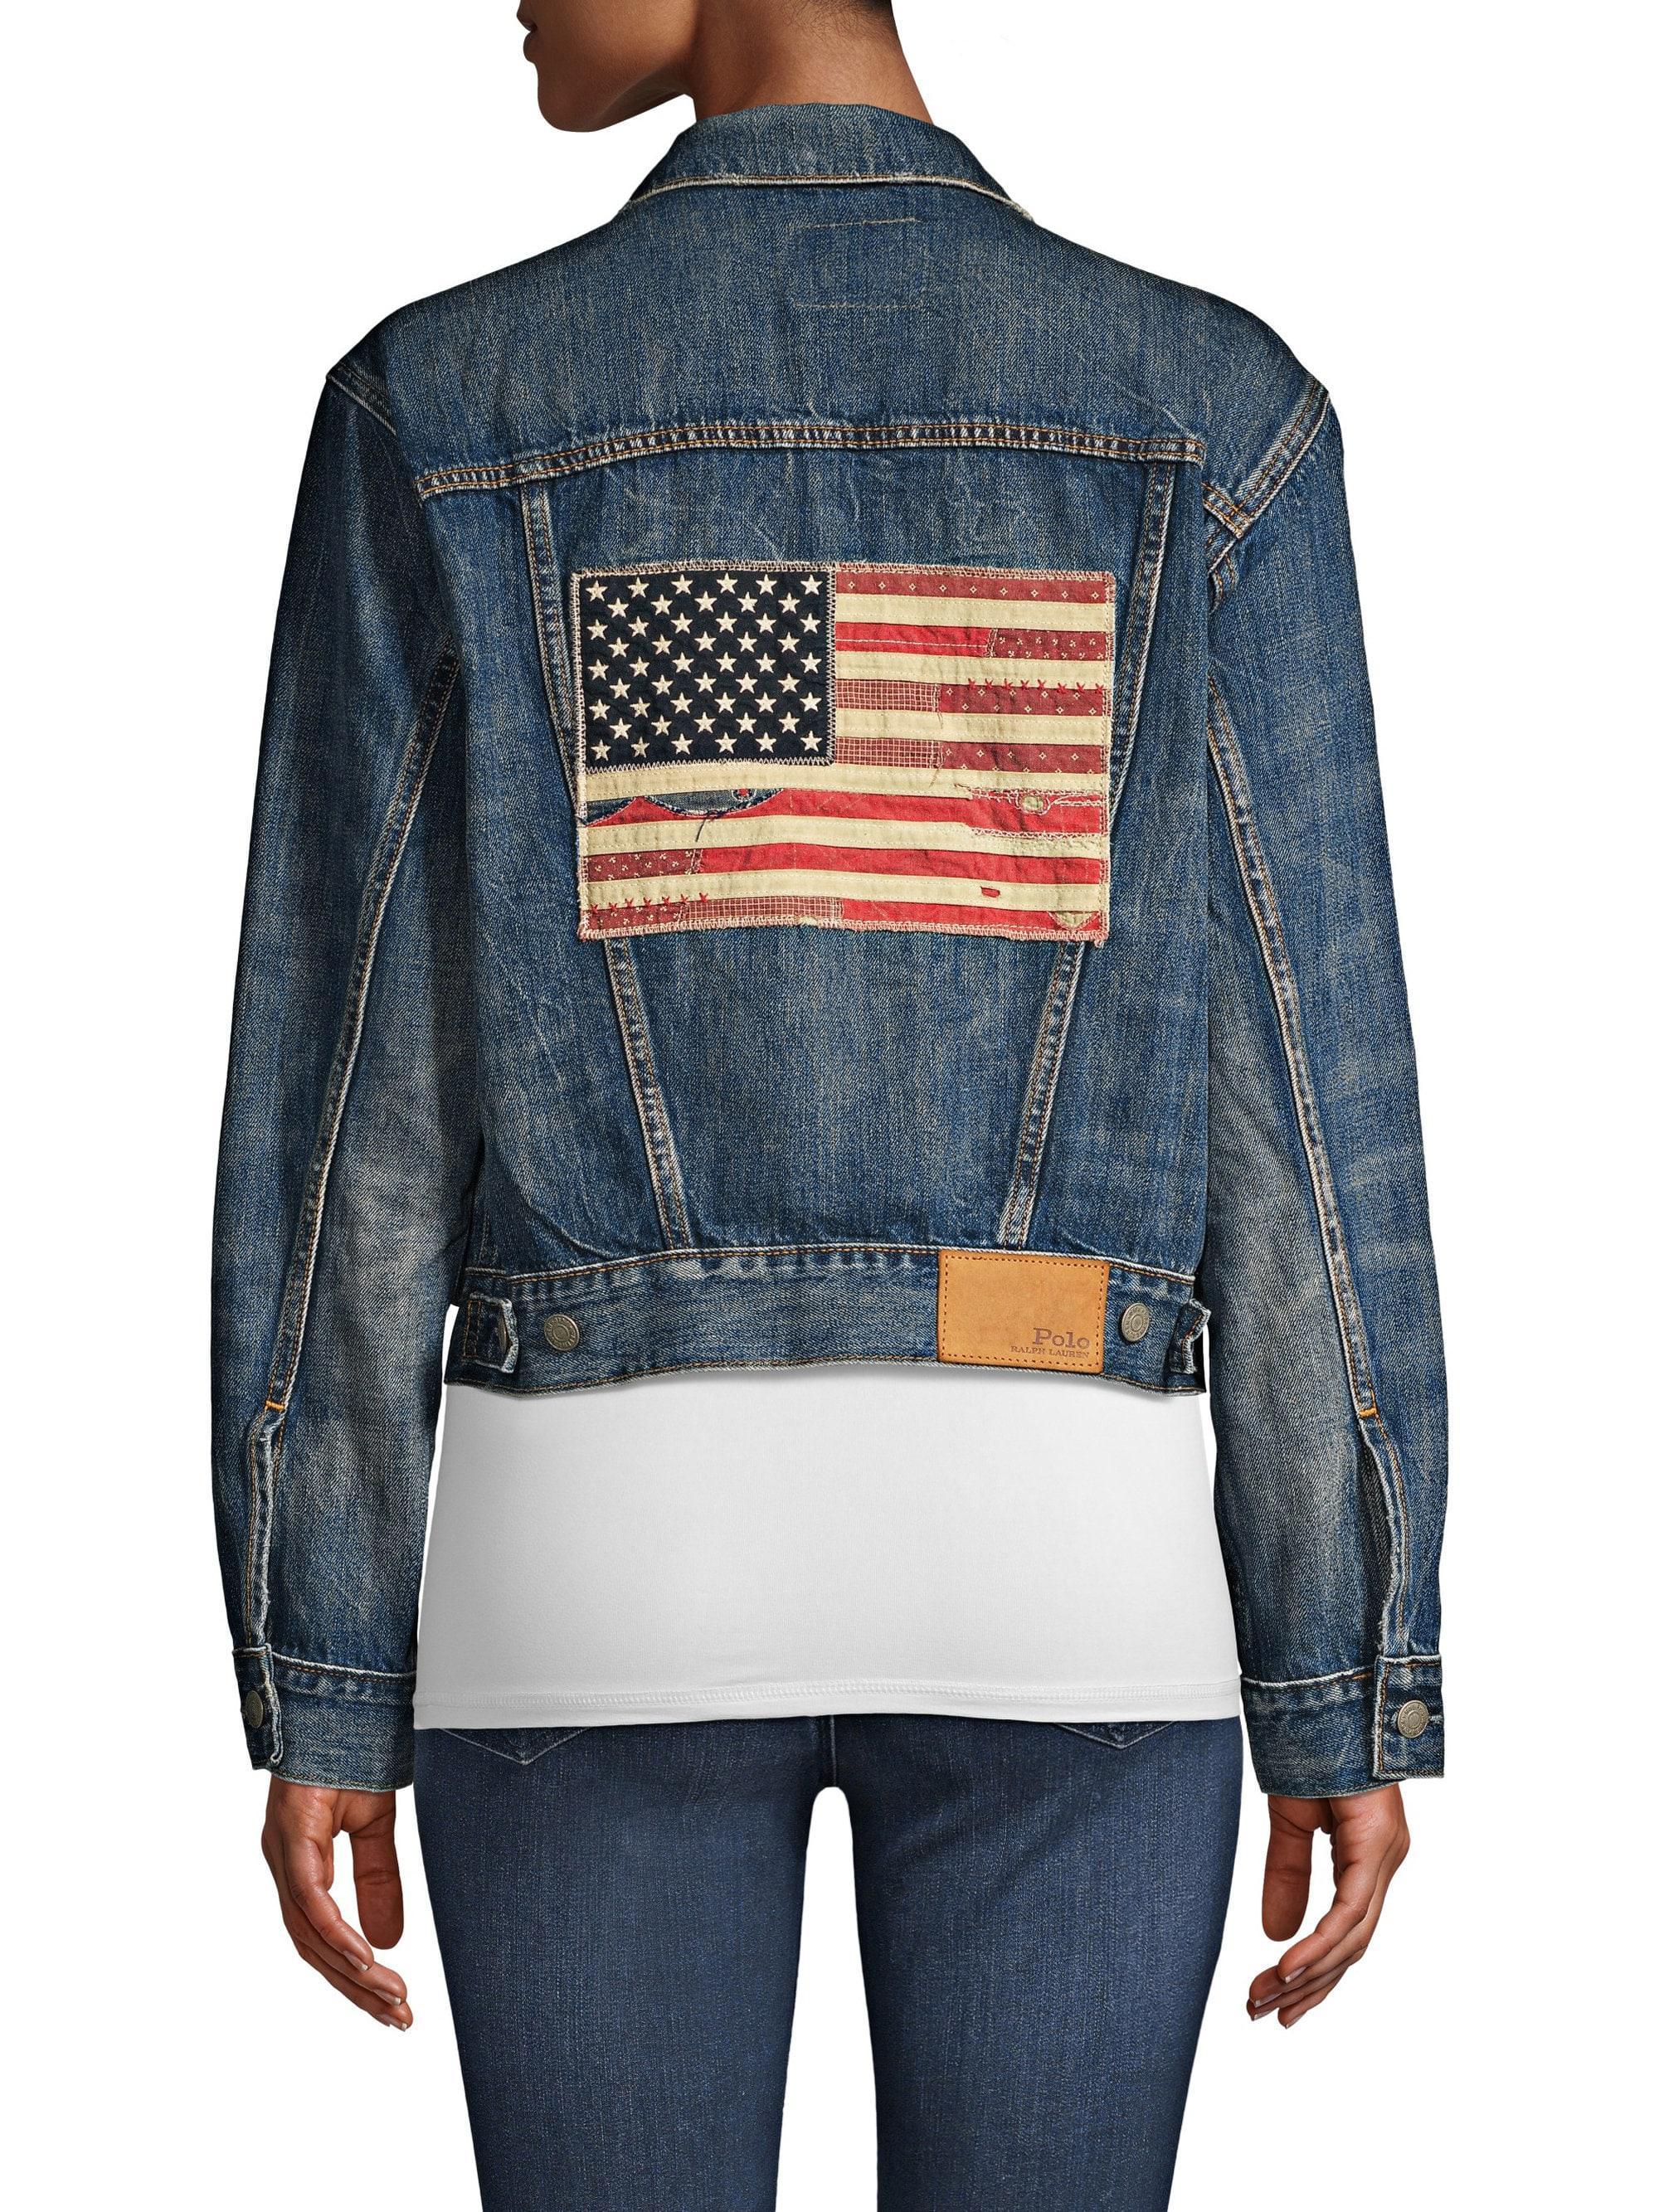 5c1c320bc Polo Ralph Lauren Blue American Flag Trucker Denim Jacket